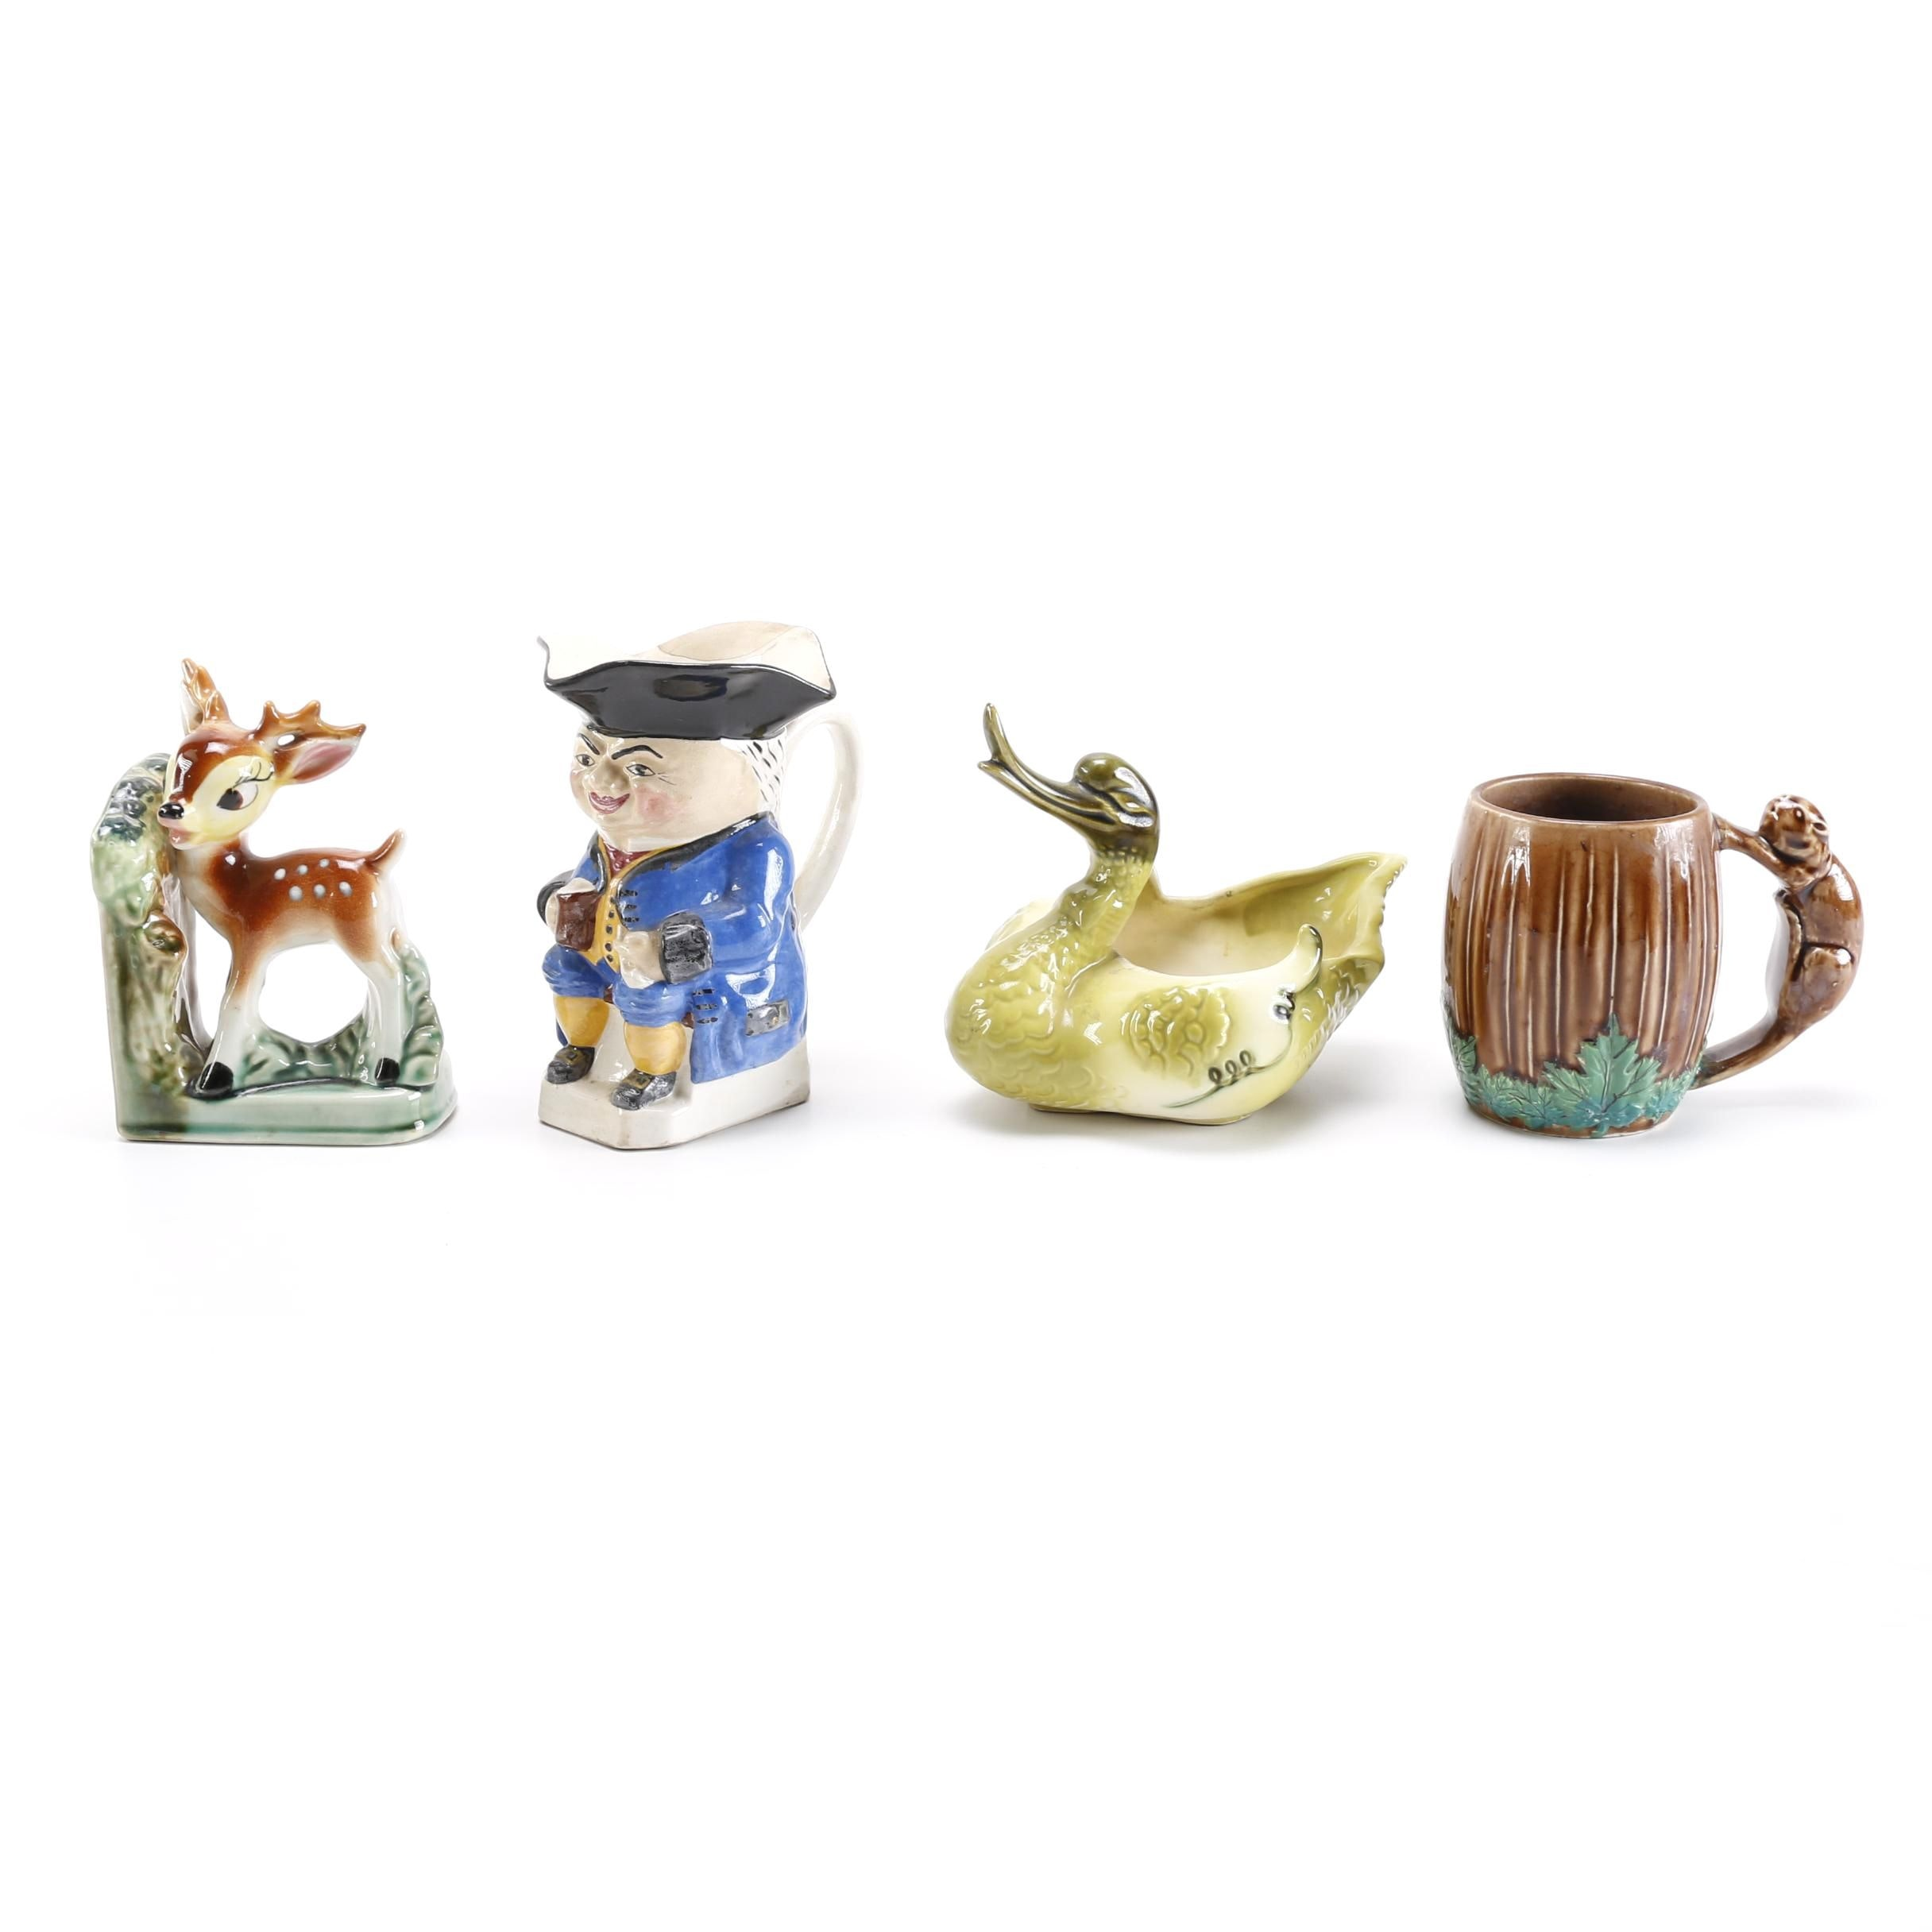 Hand-Painted Ceramic Animal Decor Including Hull